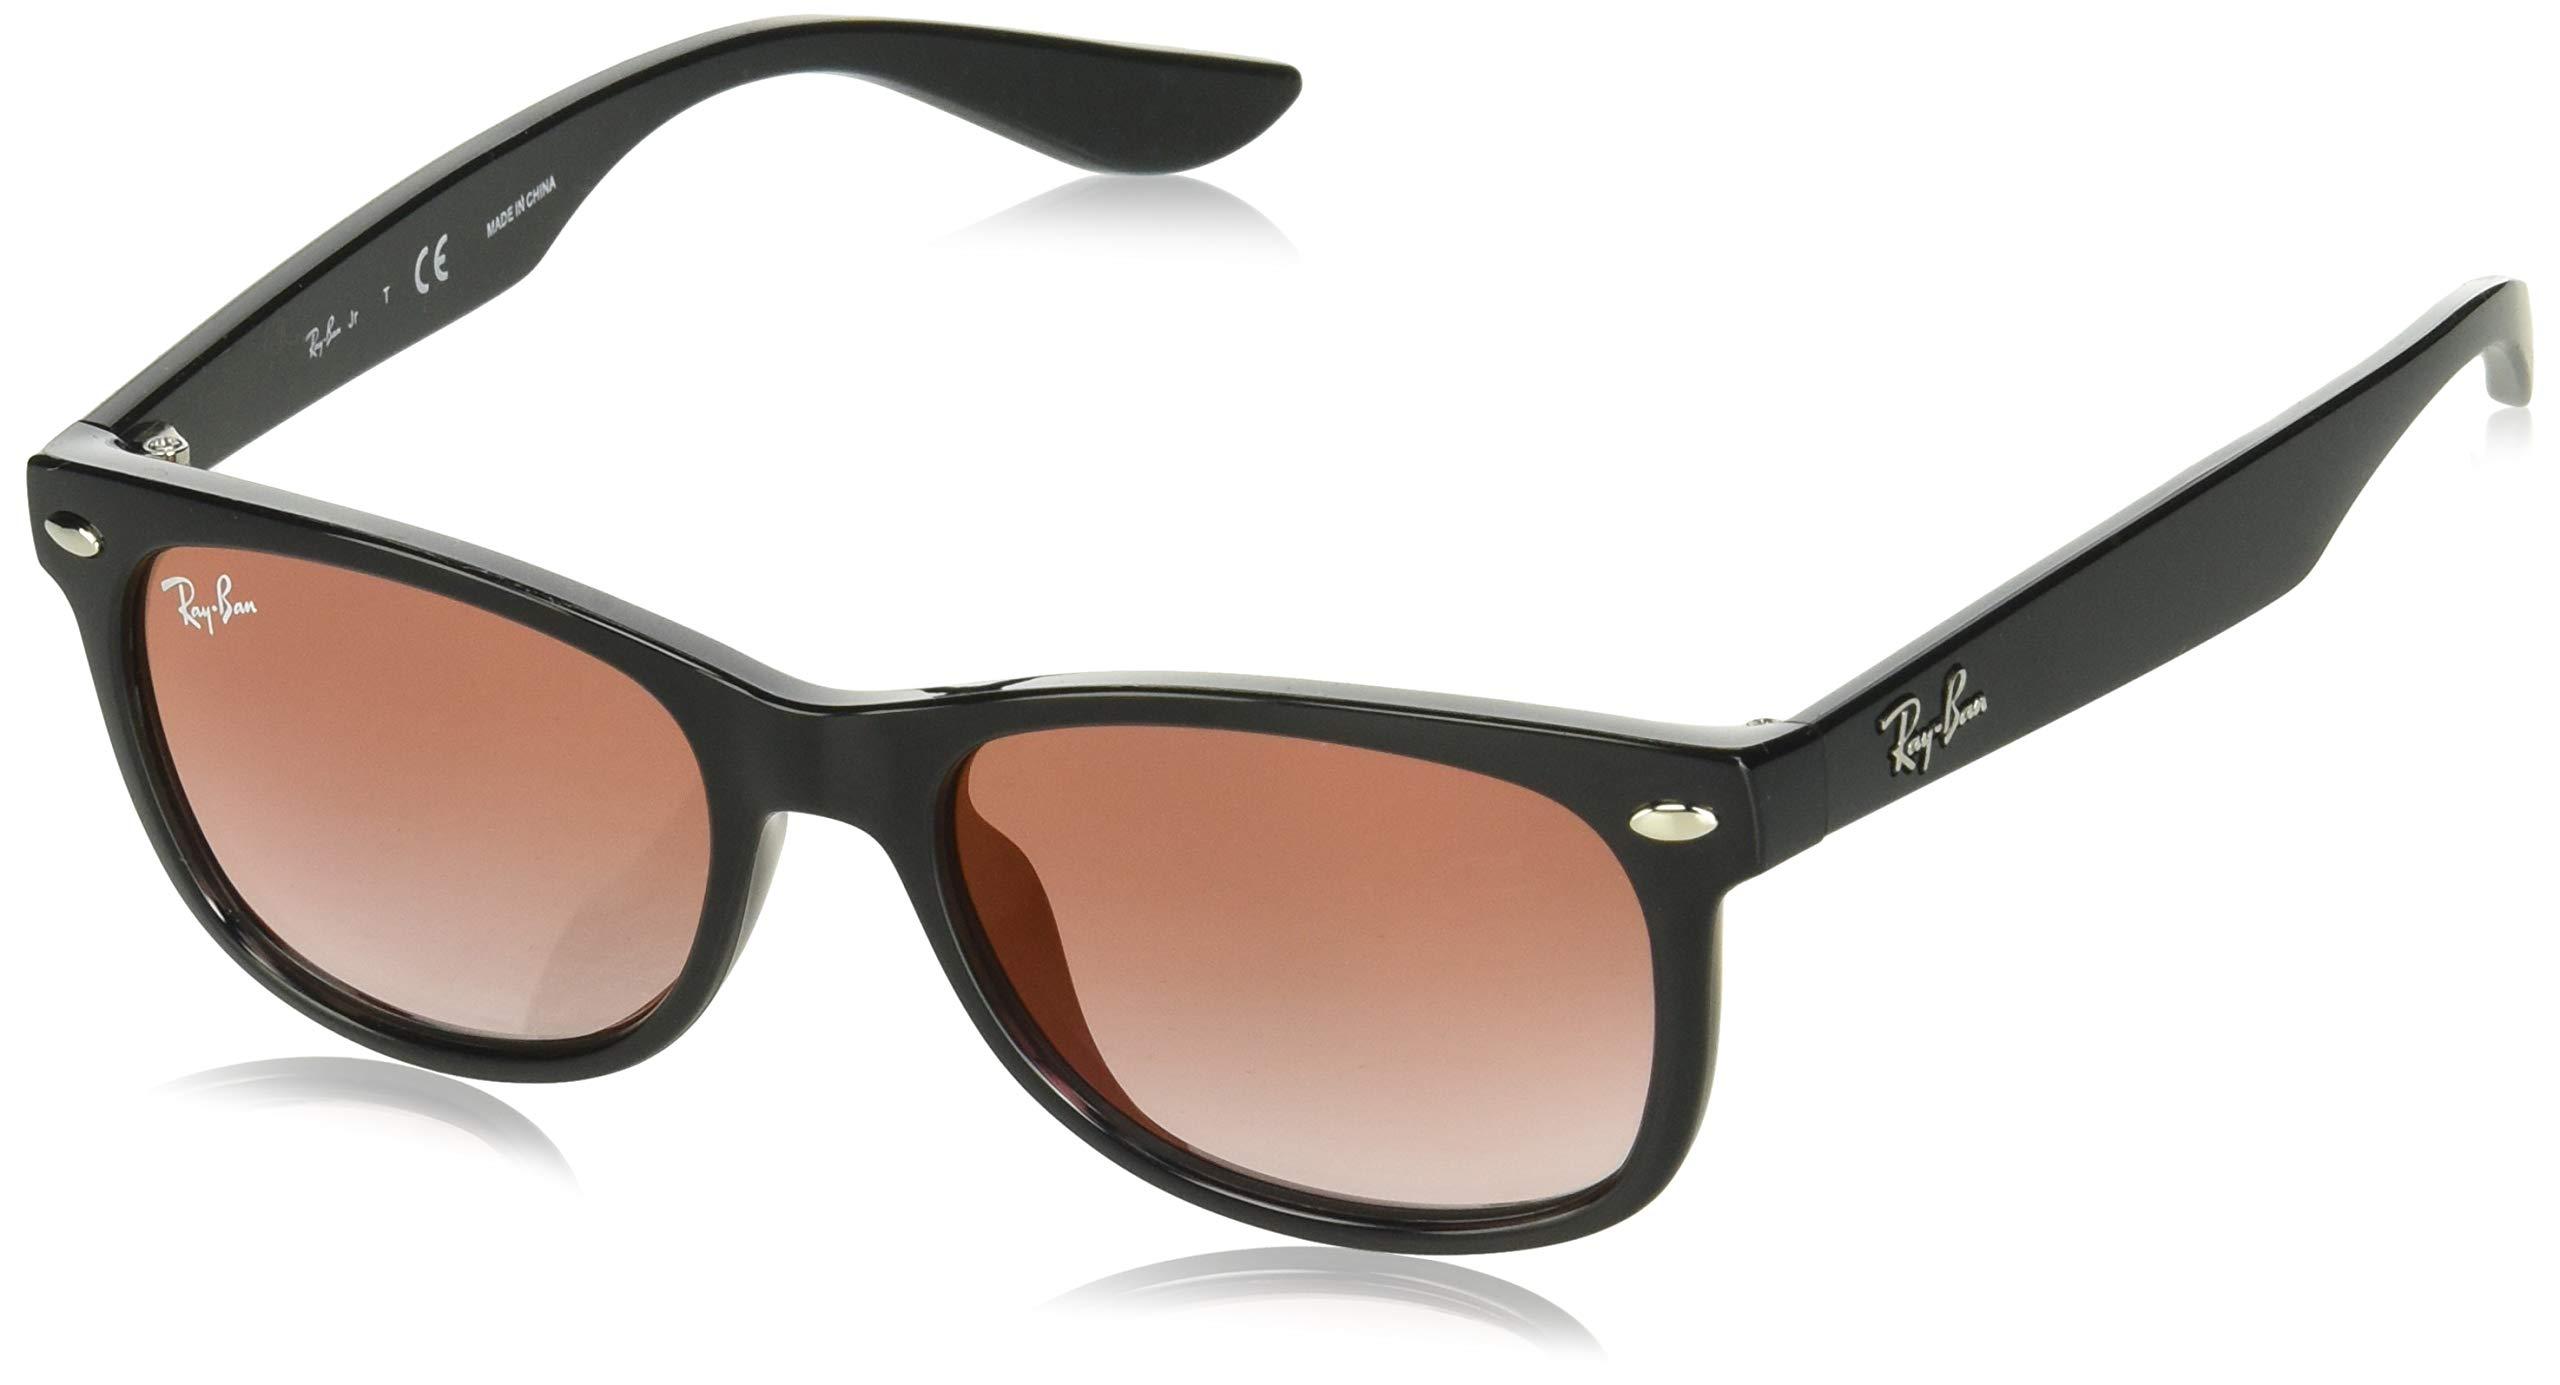 Ray-Ban Junior Kids' 0rj9052s Iridium Square Sunglasses BLACK 47 mm